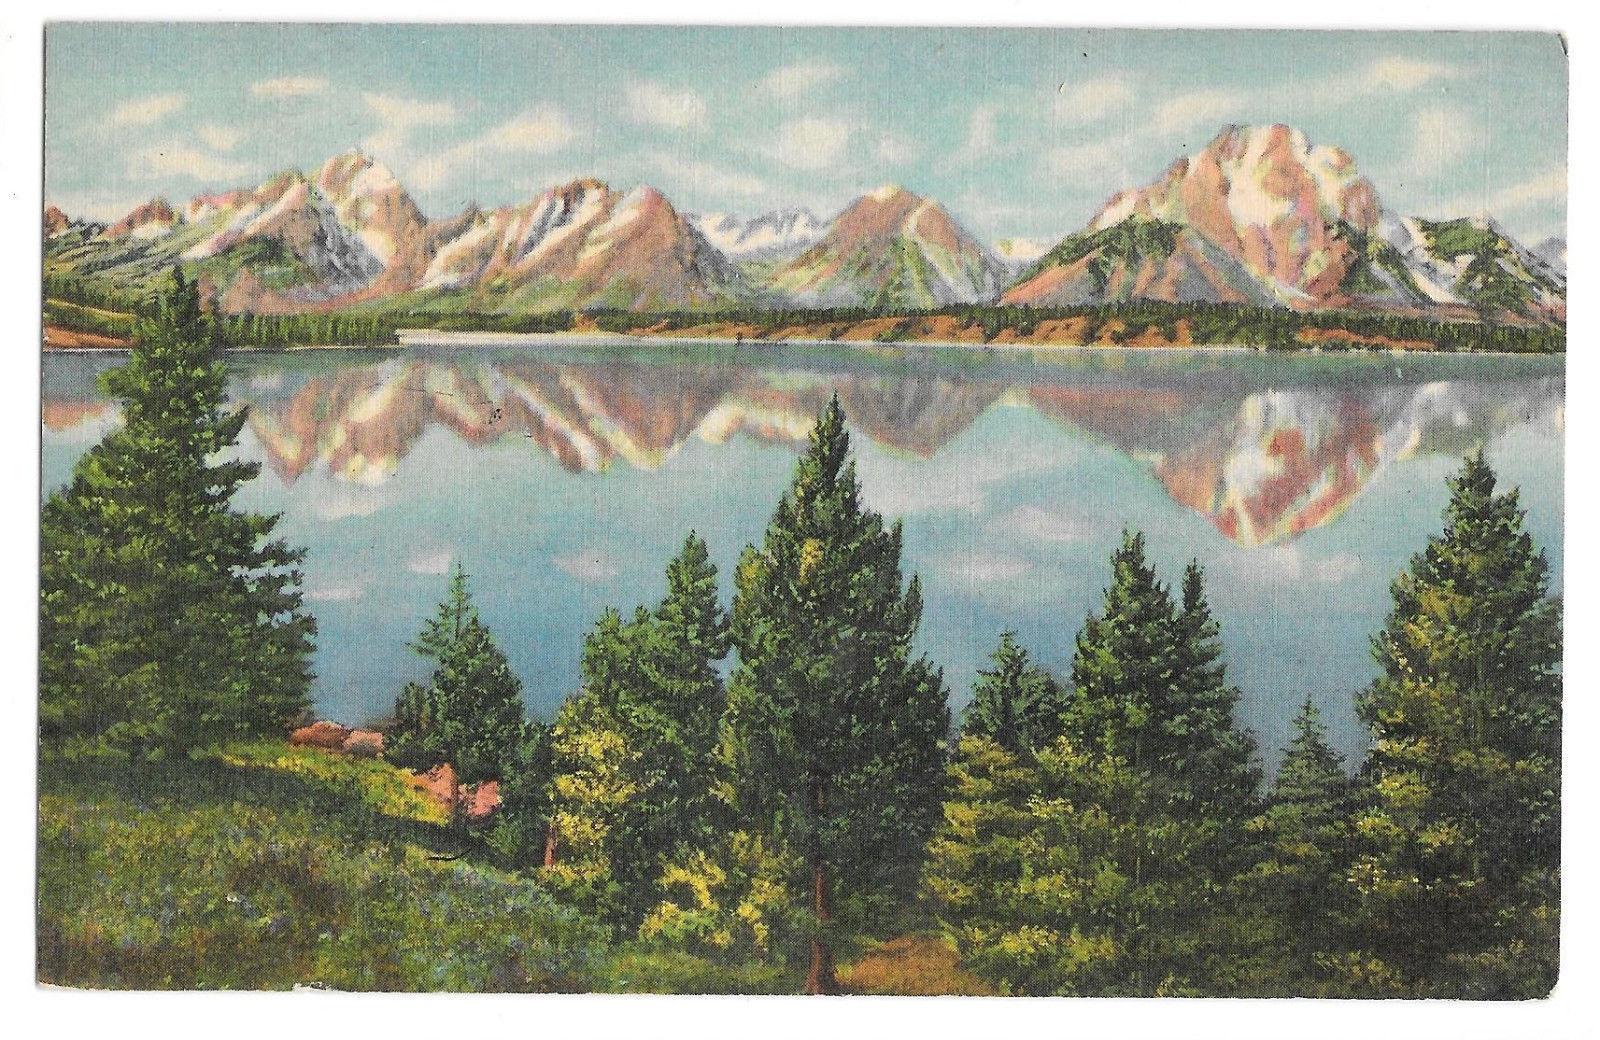 WY Teton National Park Peaks Reflected Jackson Lake Vtg Linen Postcard 1954